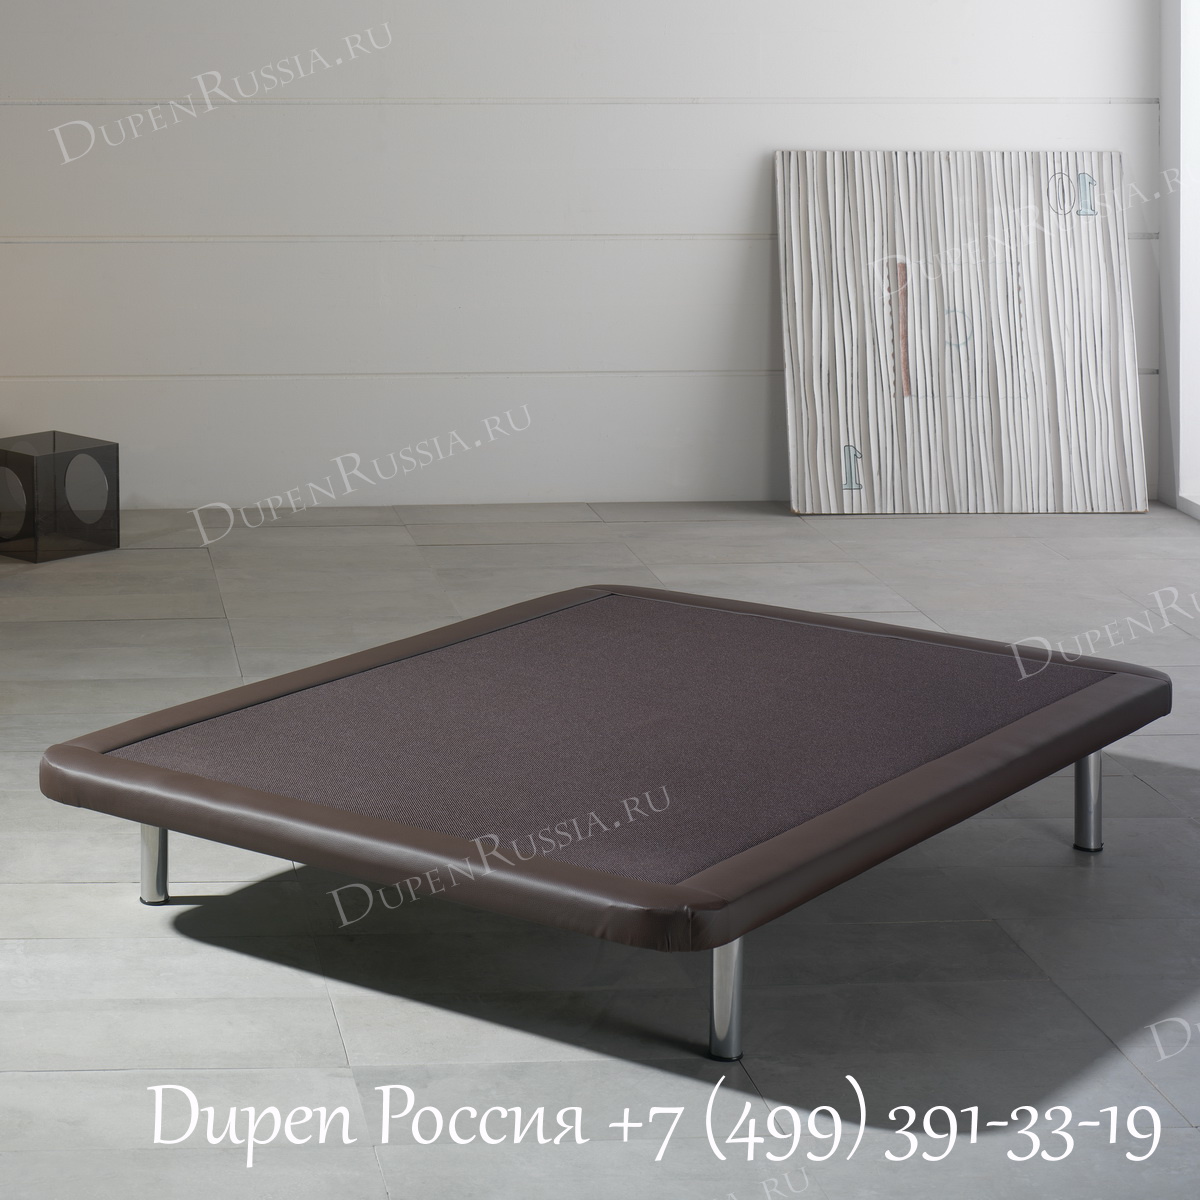 Платформа для кровати Dupen PARIS